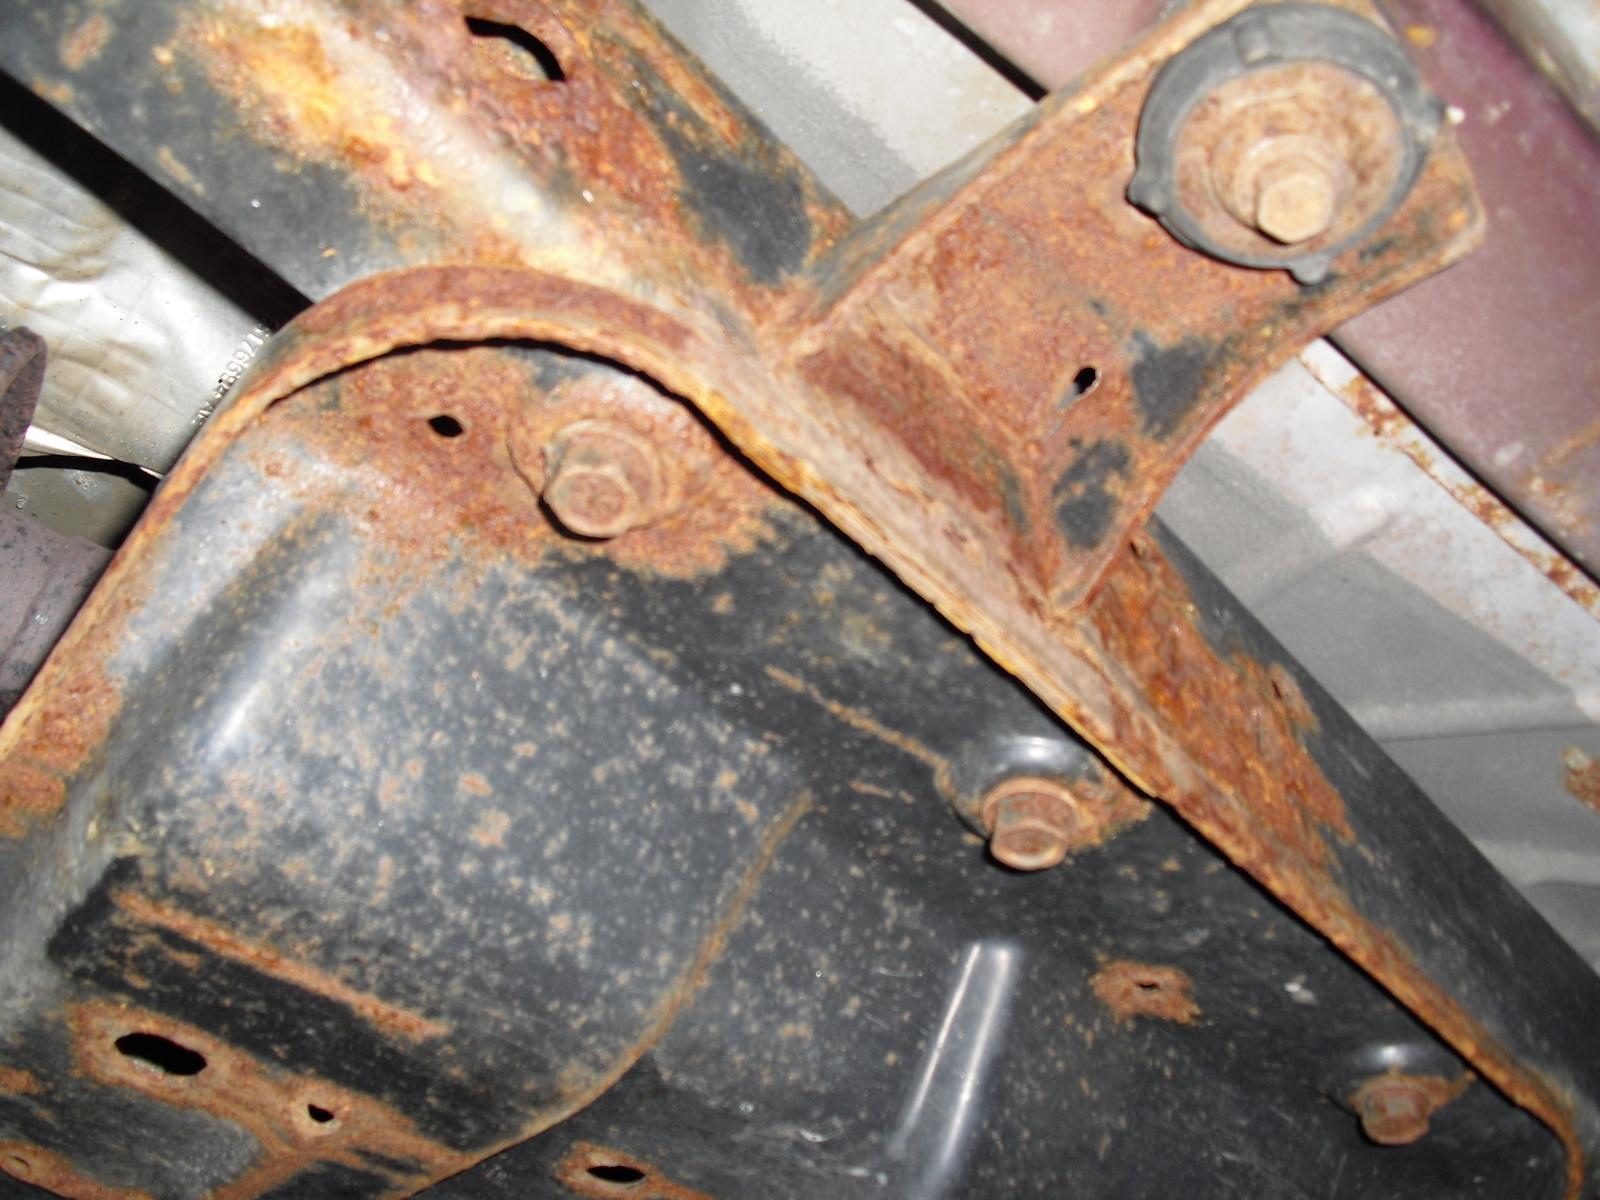 Jeep Wrangler Questions - Rusty Jeep Bottom - CarGurus